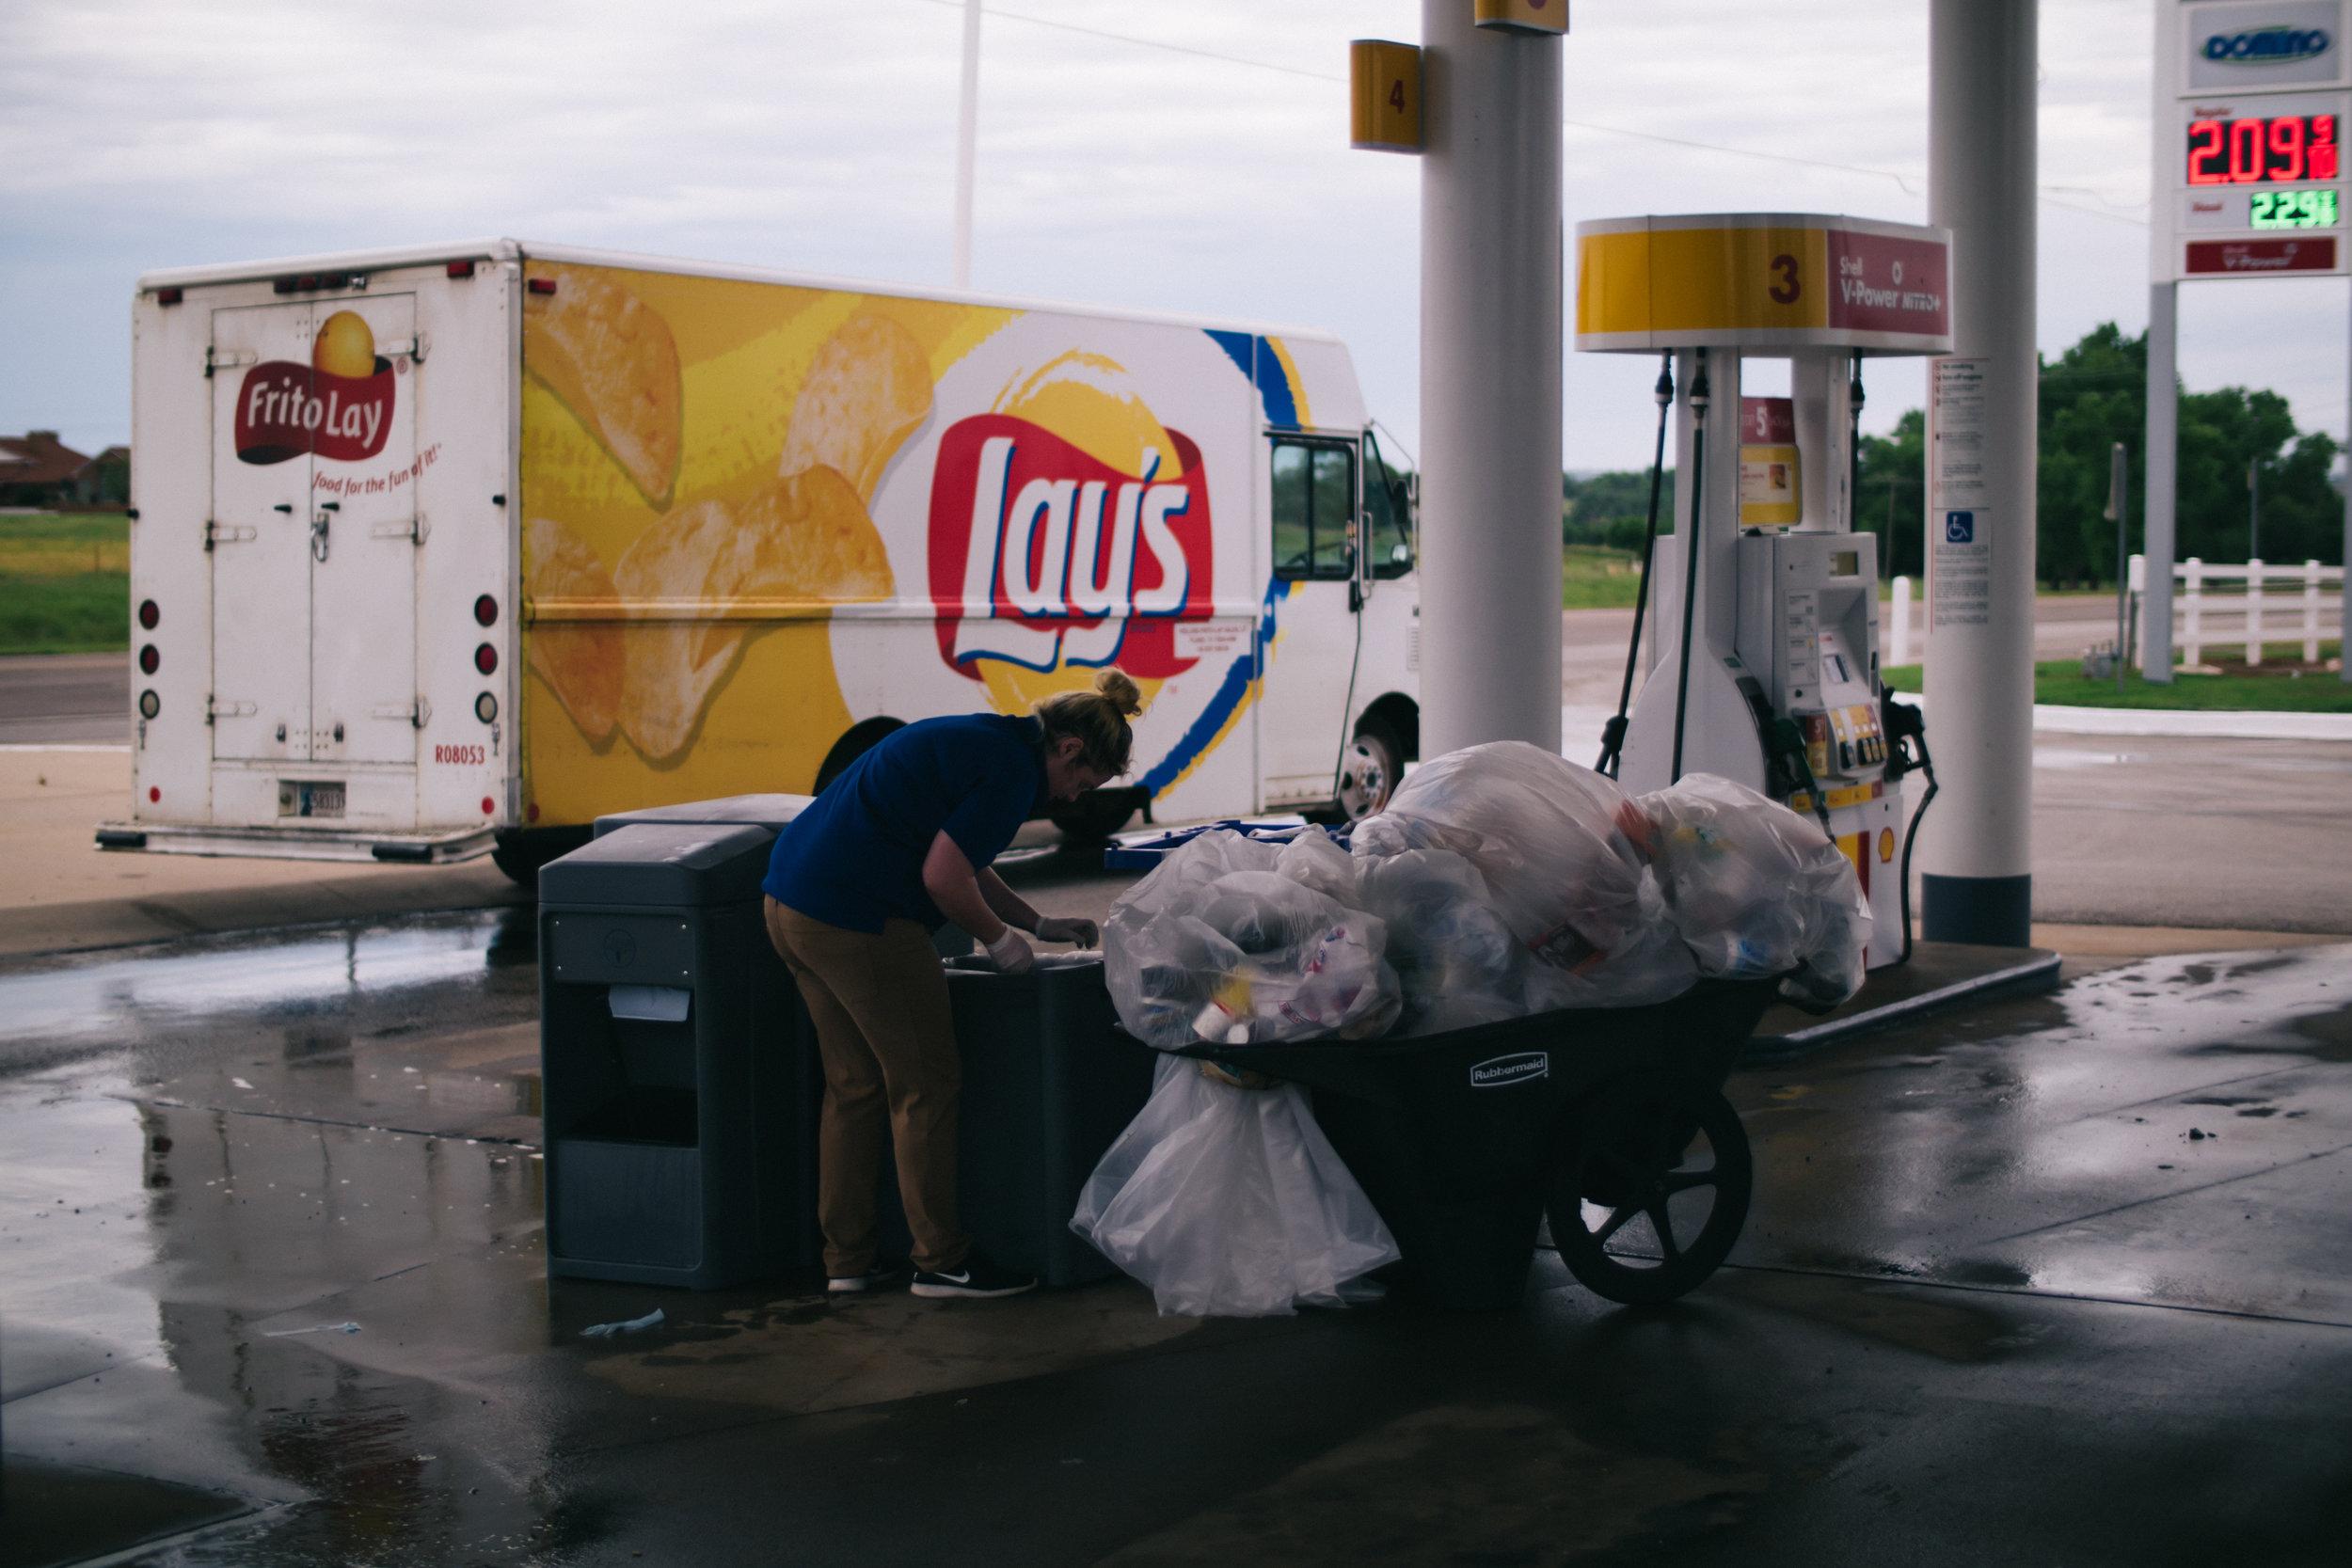 Trash in Transit, Clinton, Oklahoma, 2017